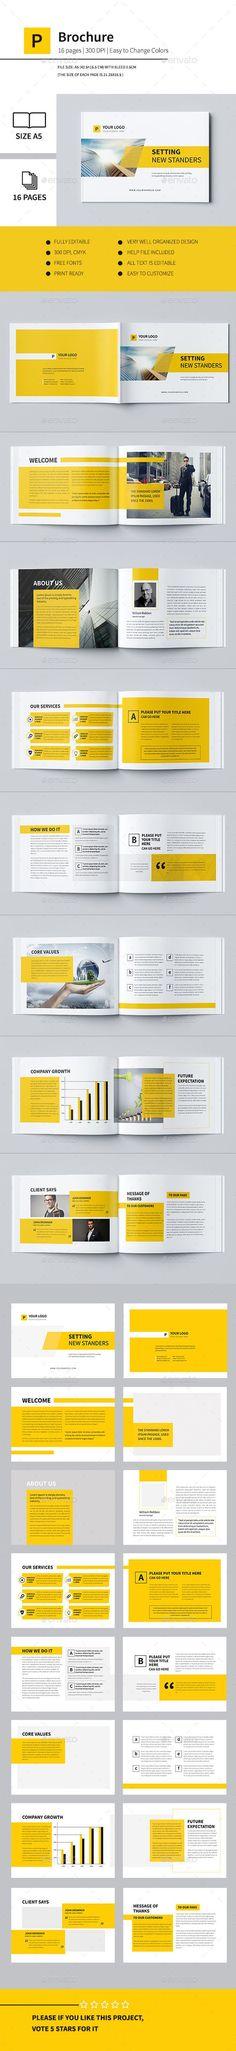 Minimal Business Brochure Template #design Download: http://graphicriver.net/item/minimal-business-brochure-ii/12243729?ref=ksioks: